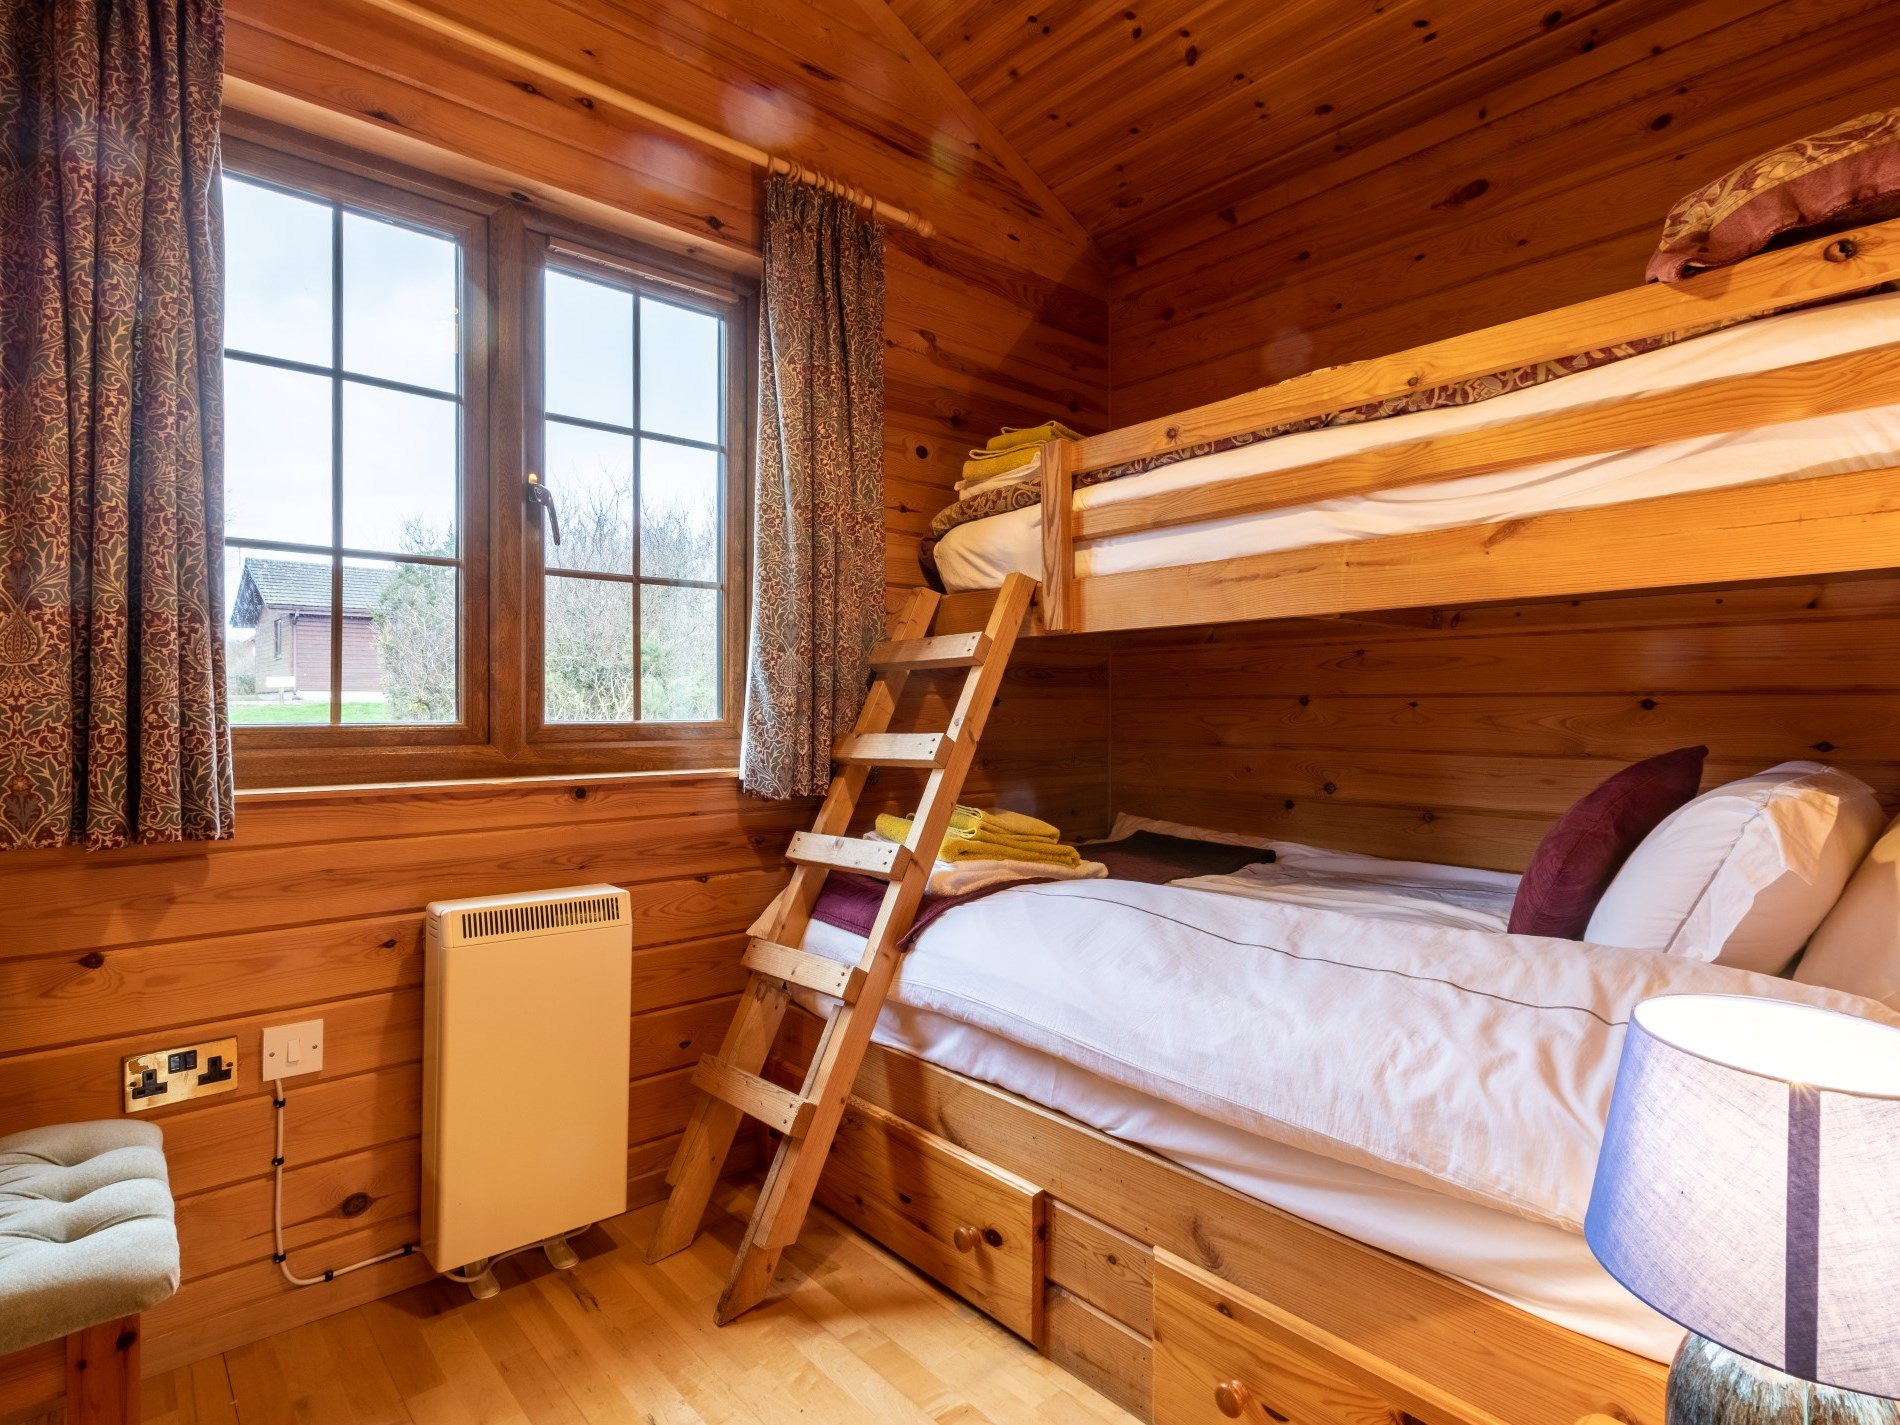 2 Bedroom Cottage in Bideford, Devon